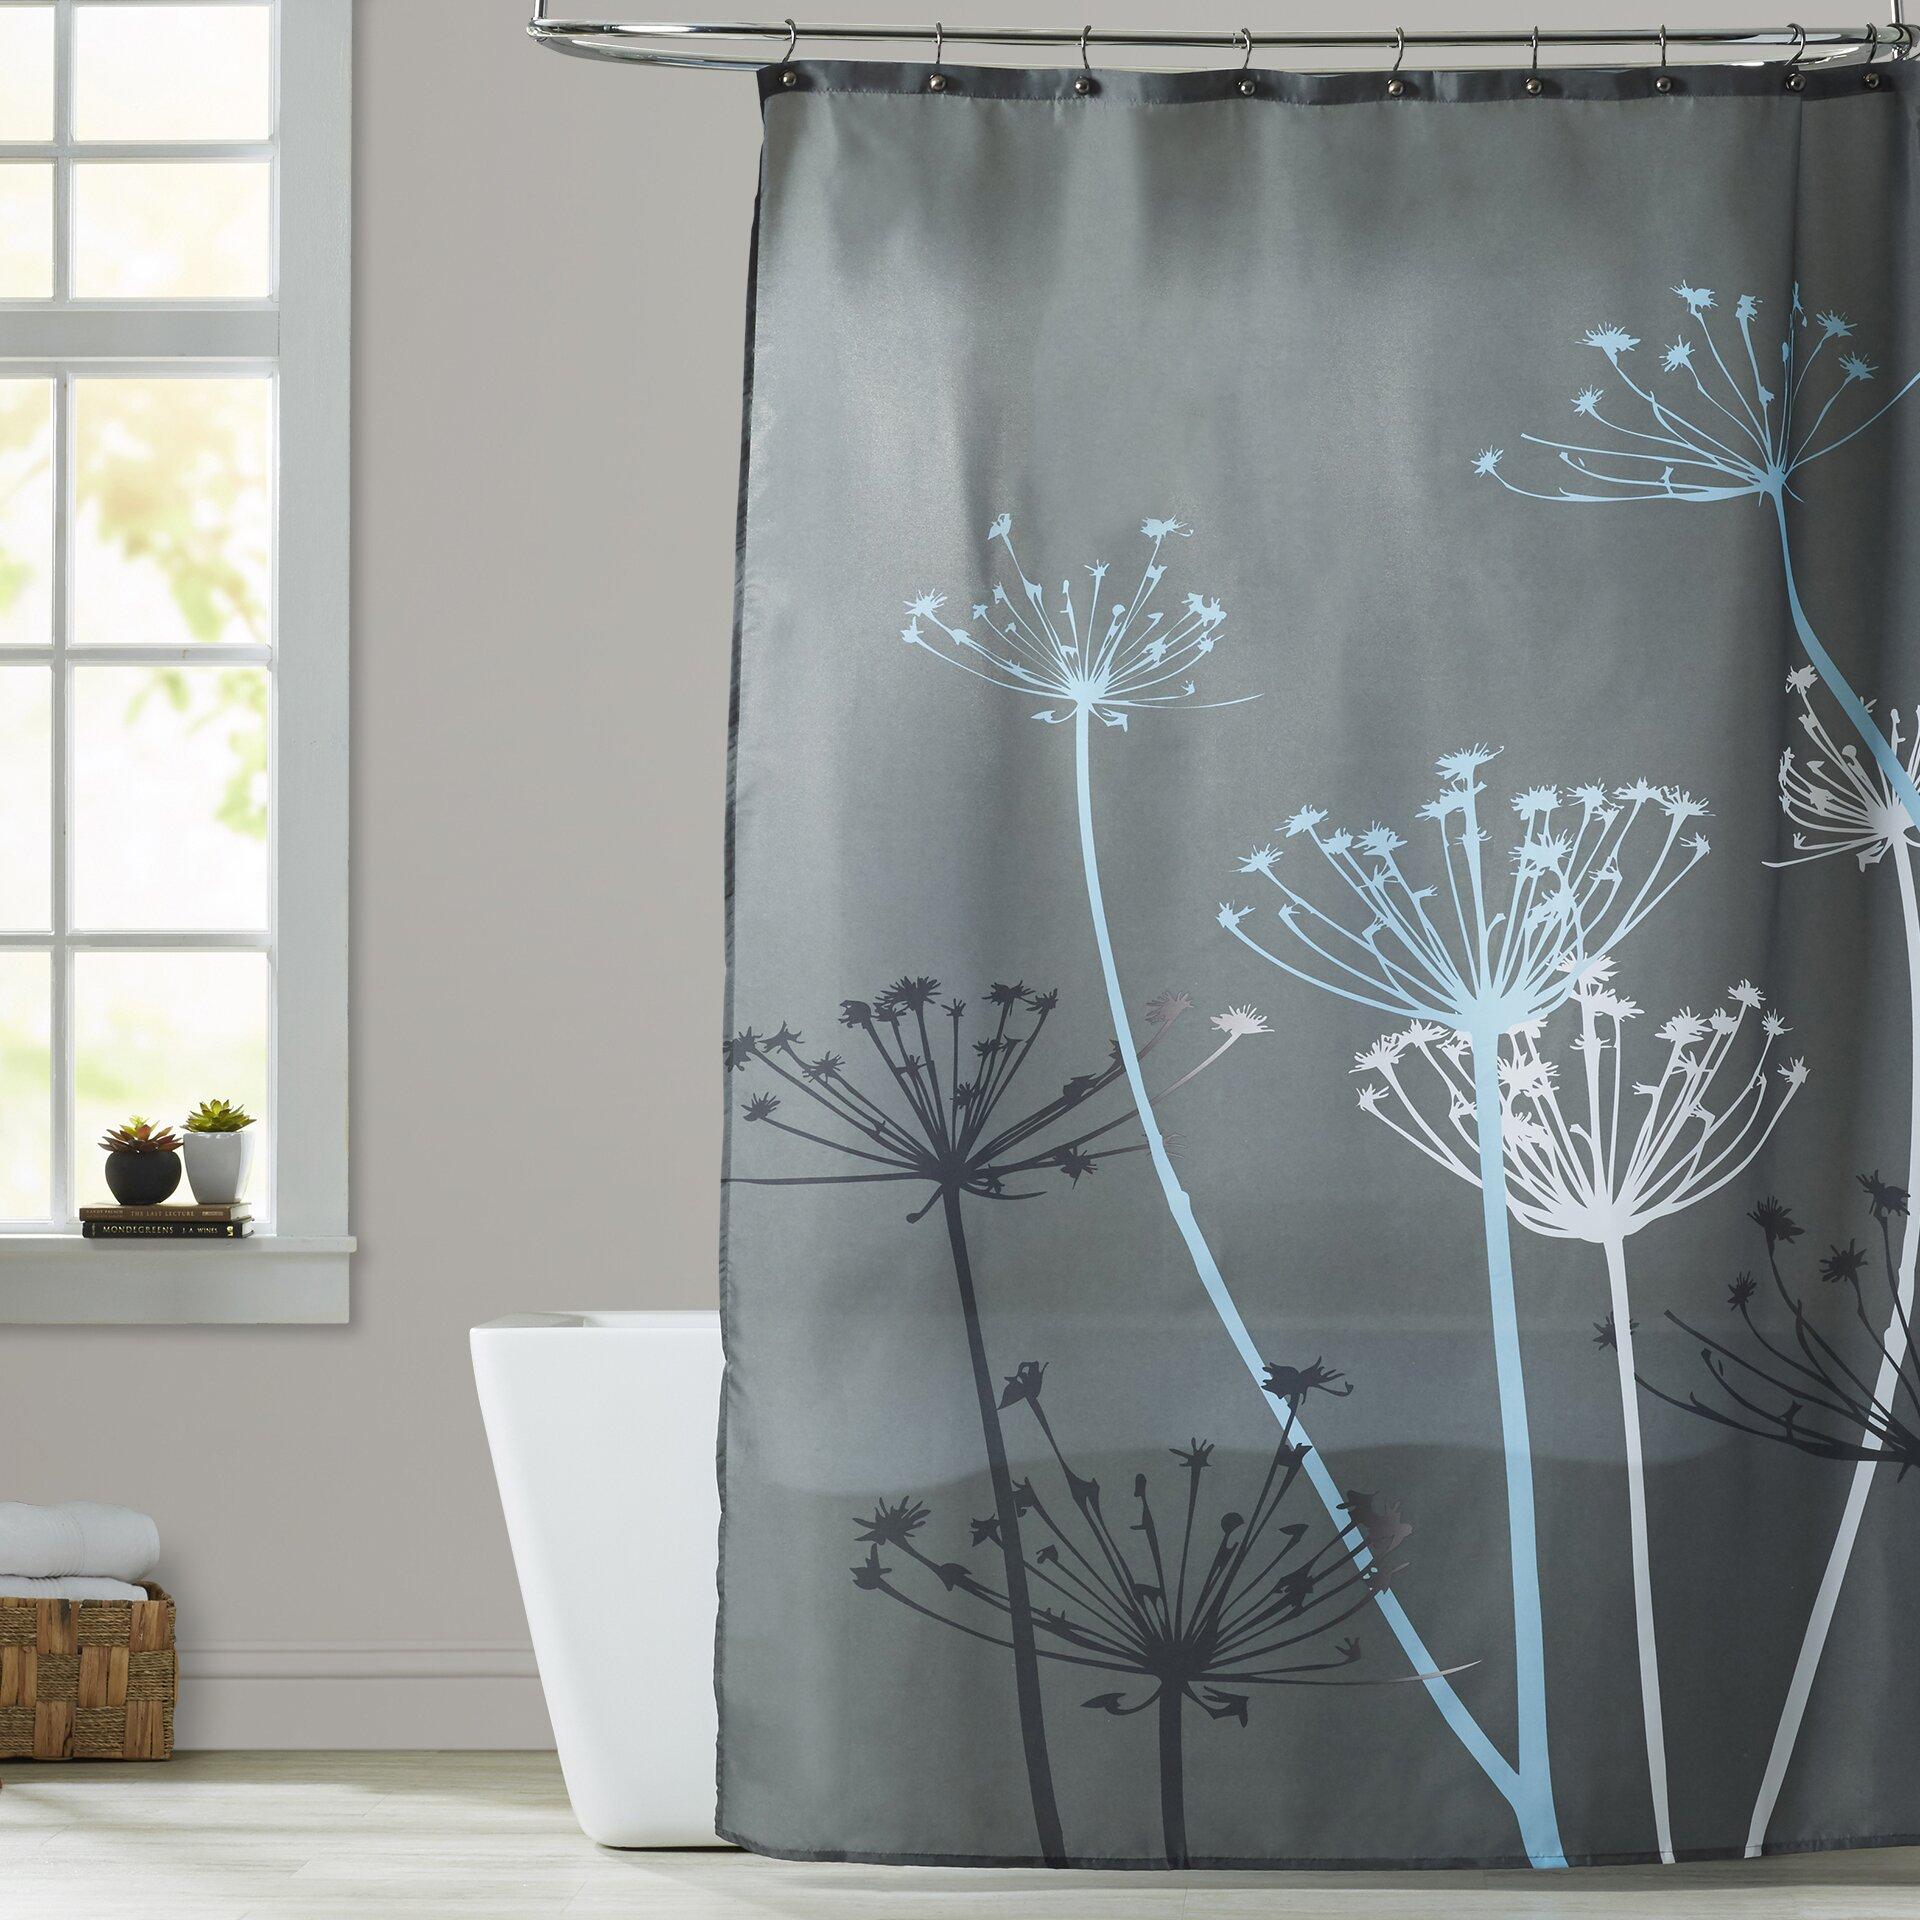 Mermaid Shower Curtain Kids - Kids mermaid shower curtain